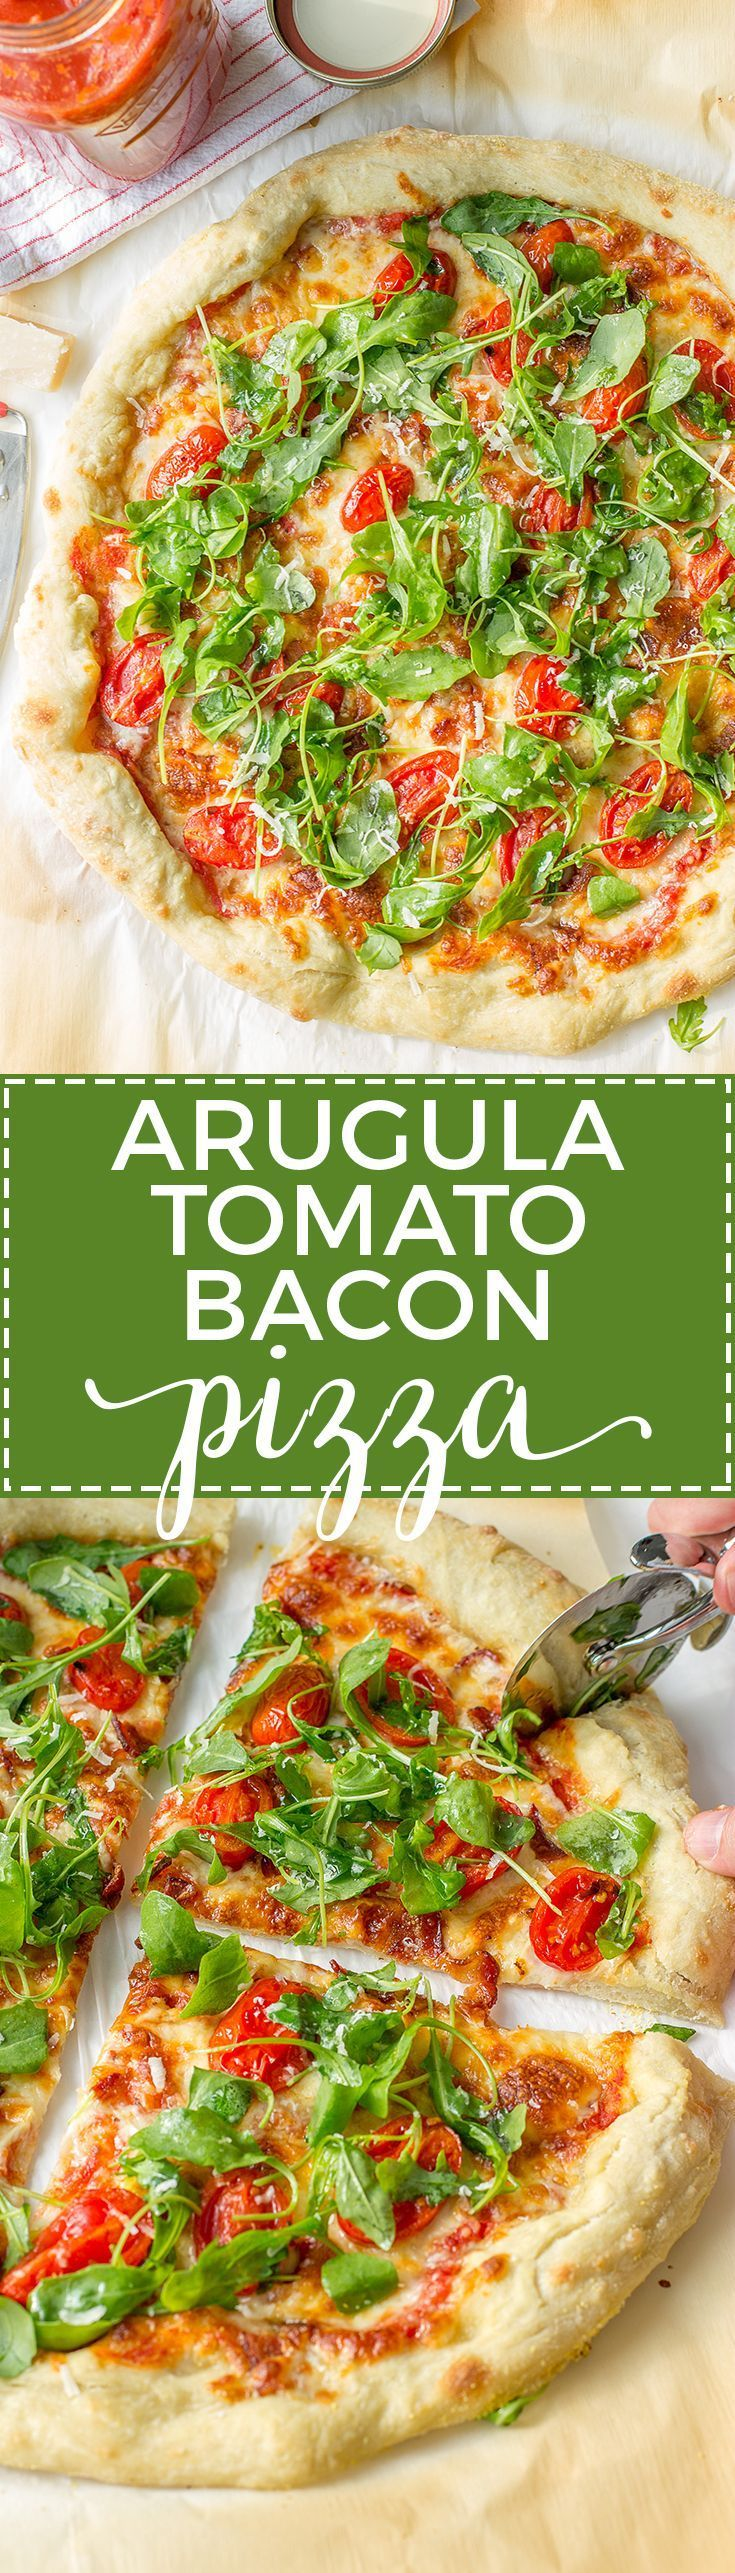 Arugula tomato bacon pizza delivers major flavor and is quick for a weeknight. www.nourish-and-fete.com via @nourishandfete